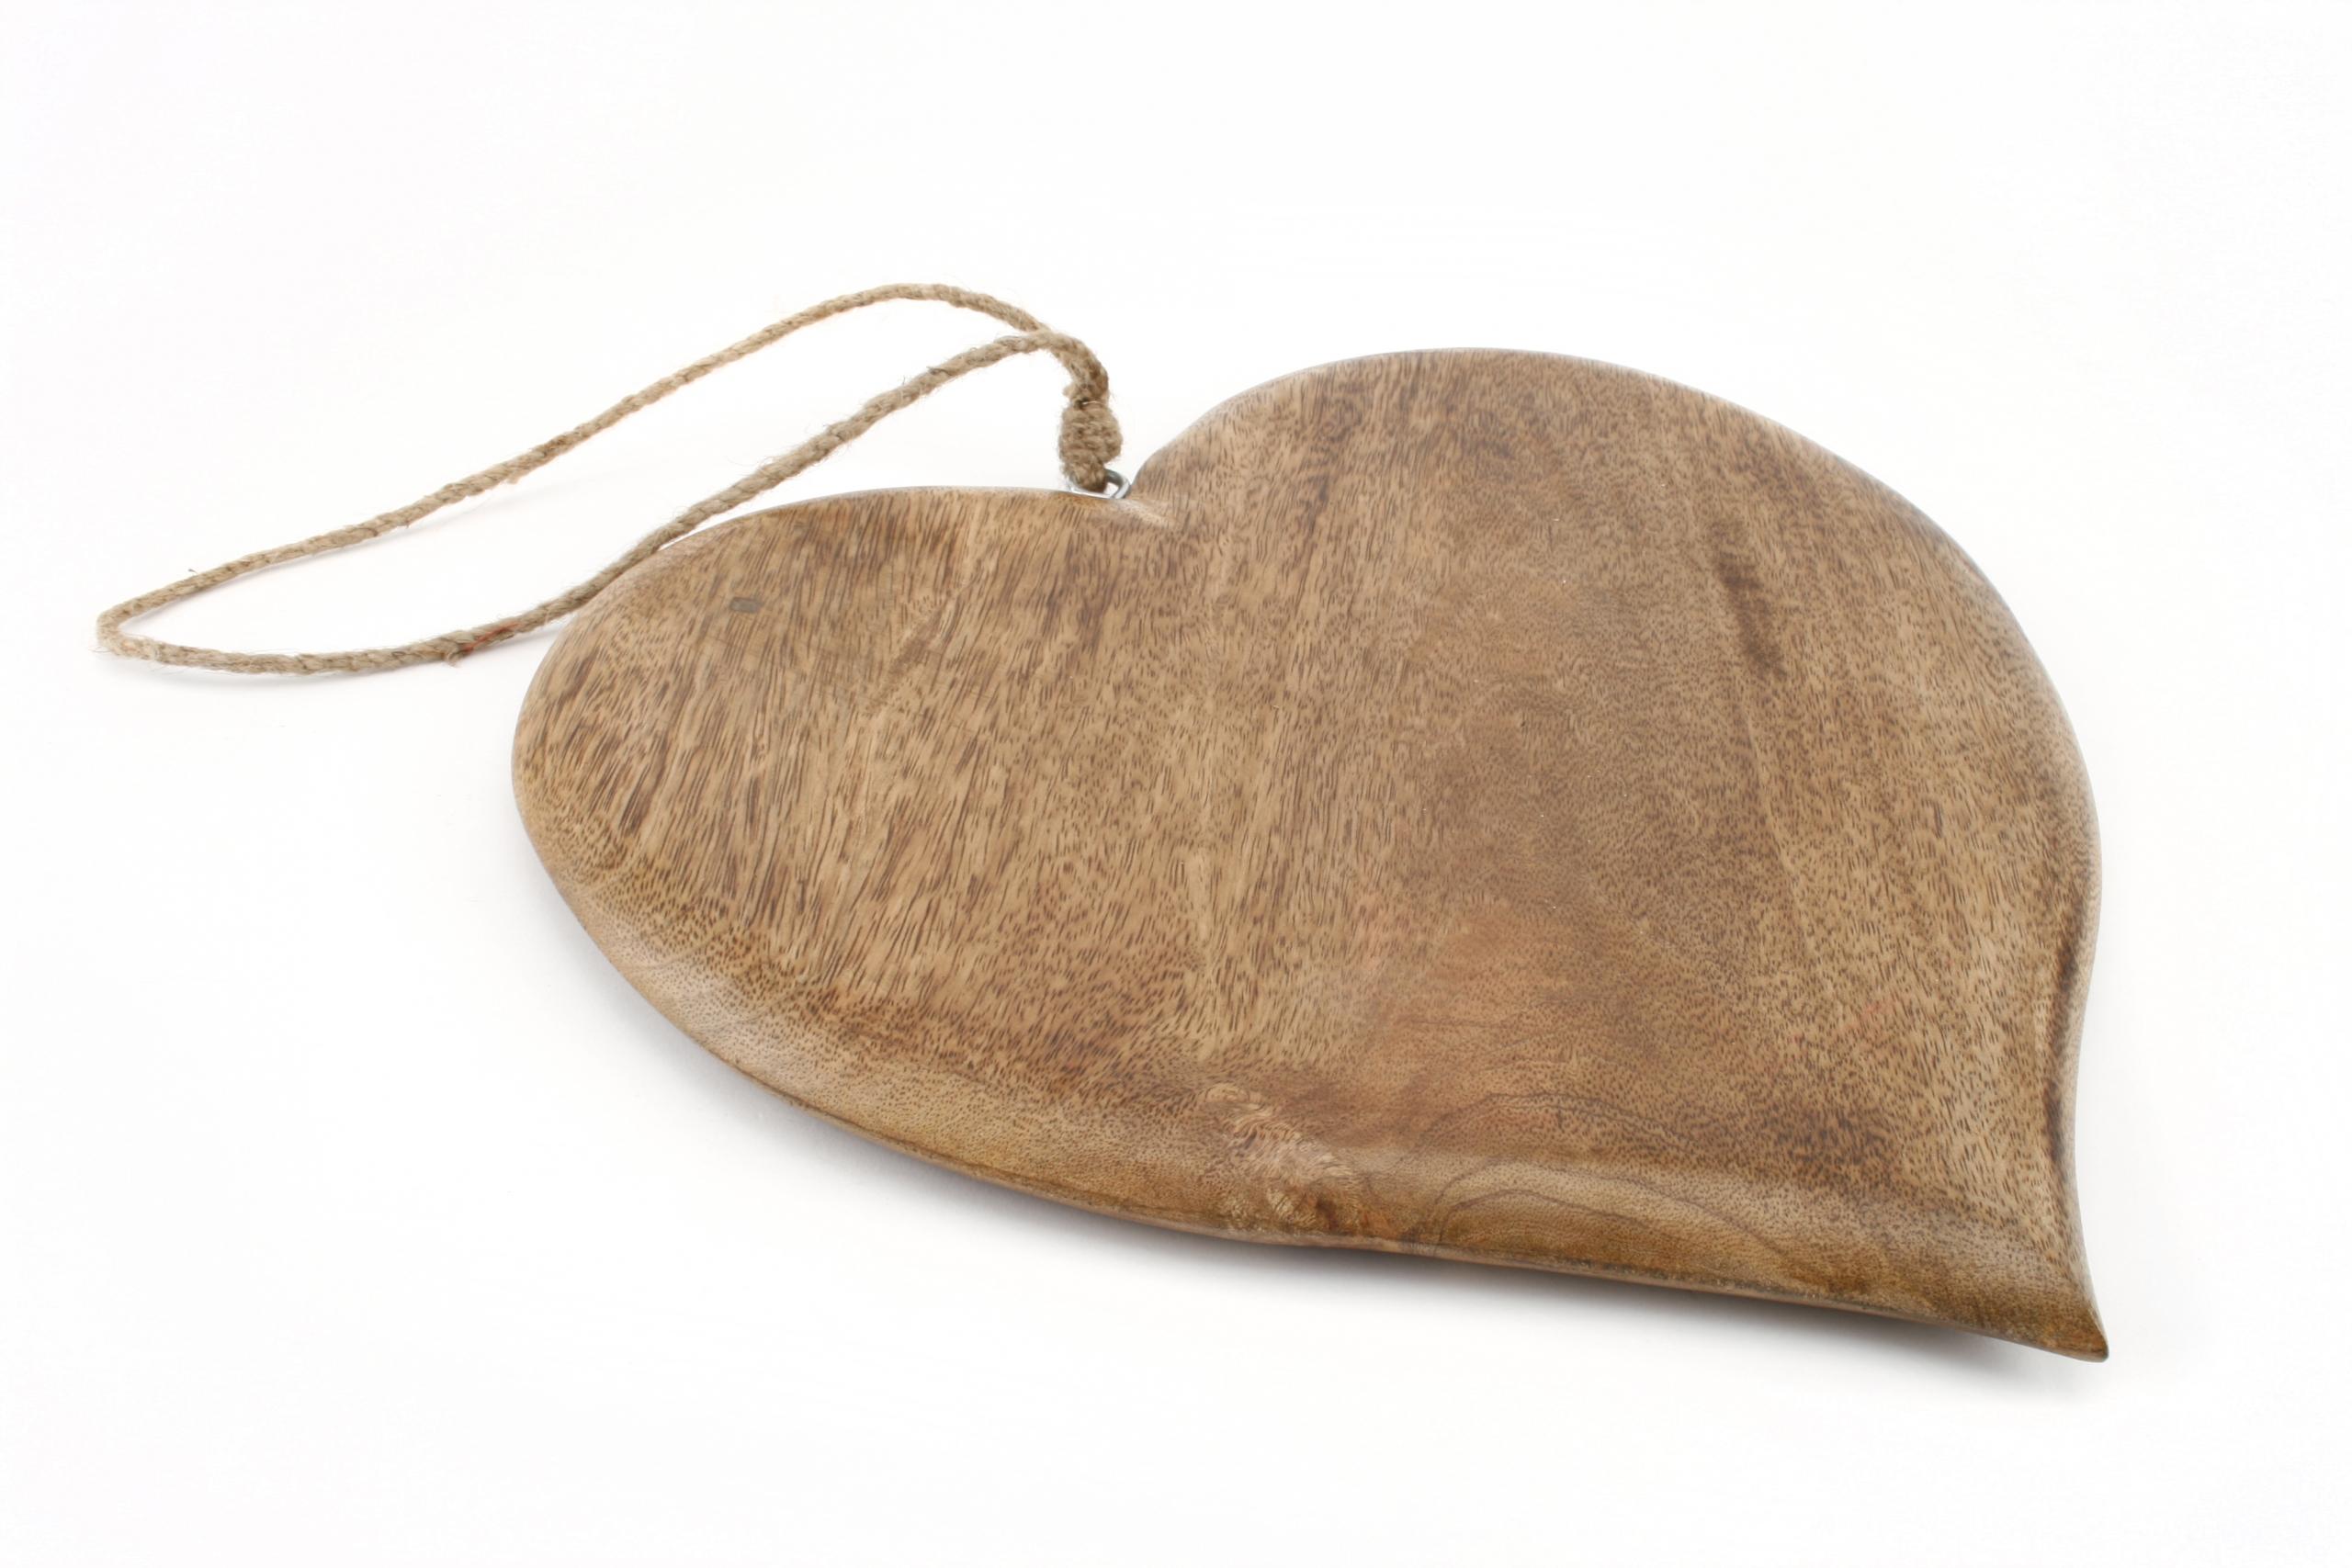 Wooden heart hanging chopping board